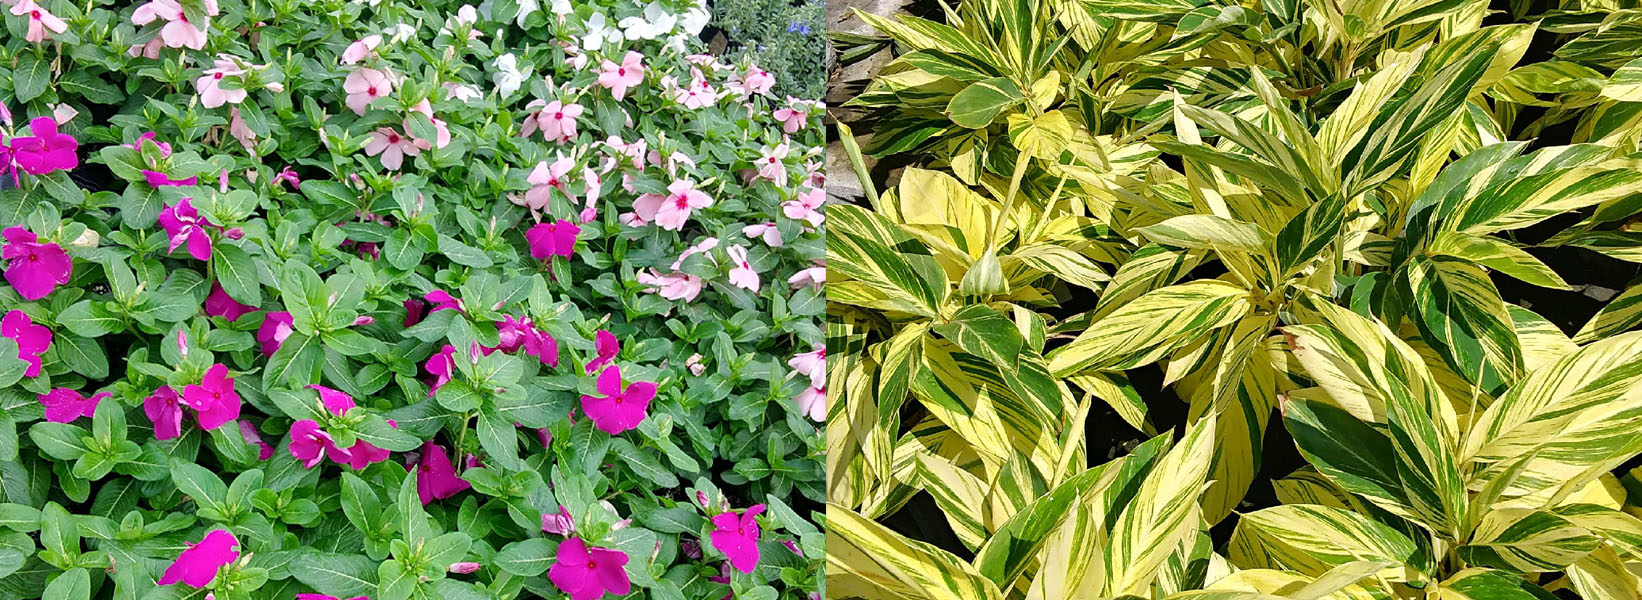 Pachyphytum Plant Service